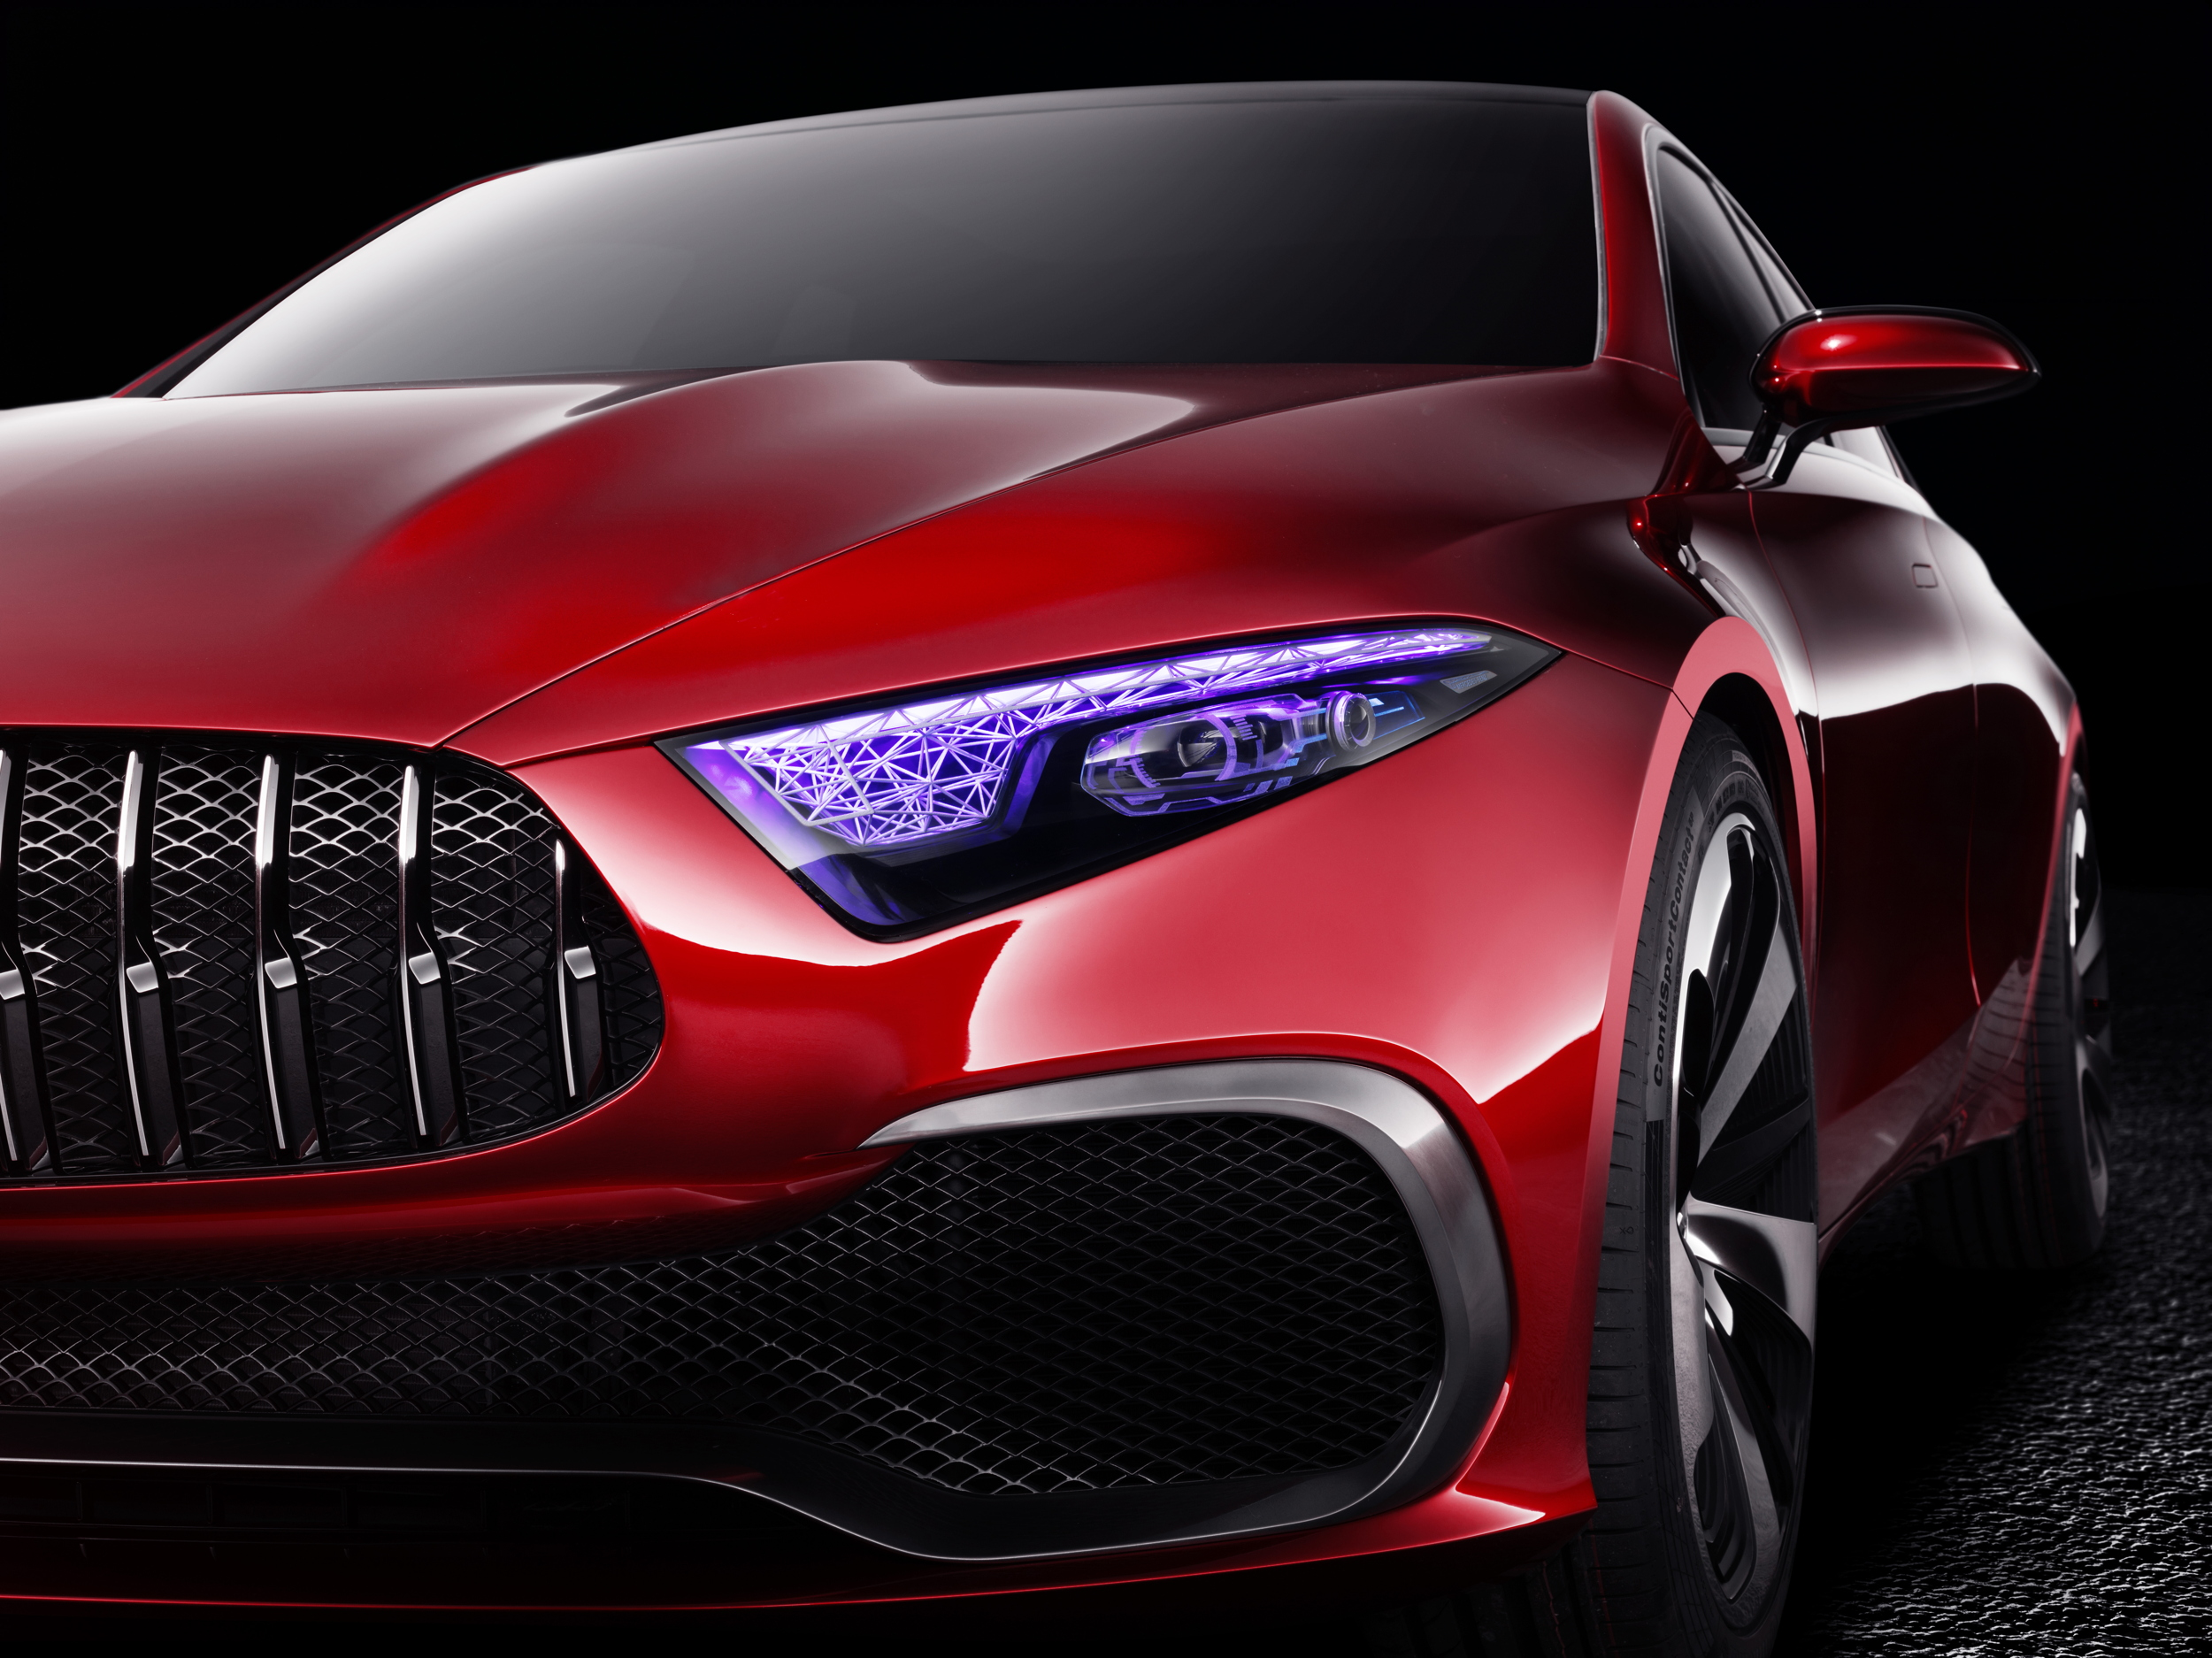 Mercedes-Benz Concept A Sedan front detail